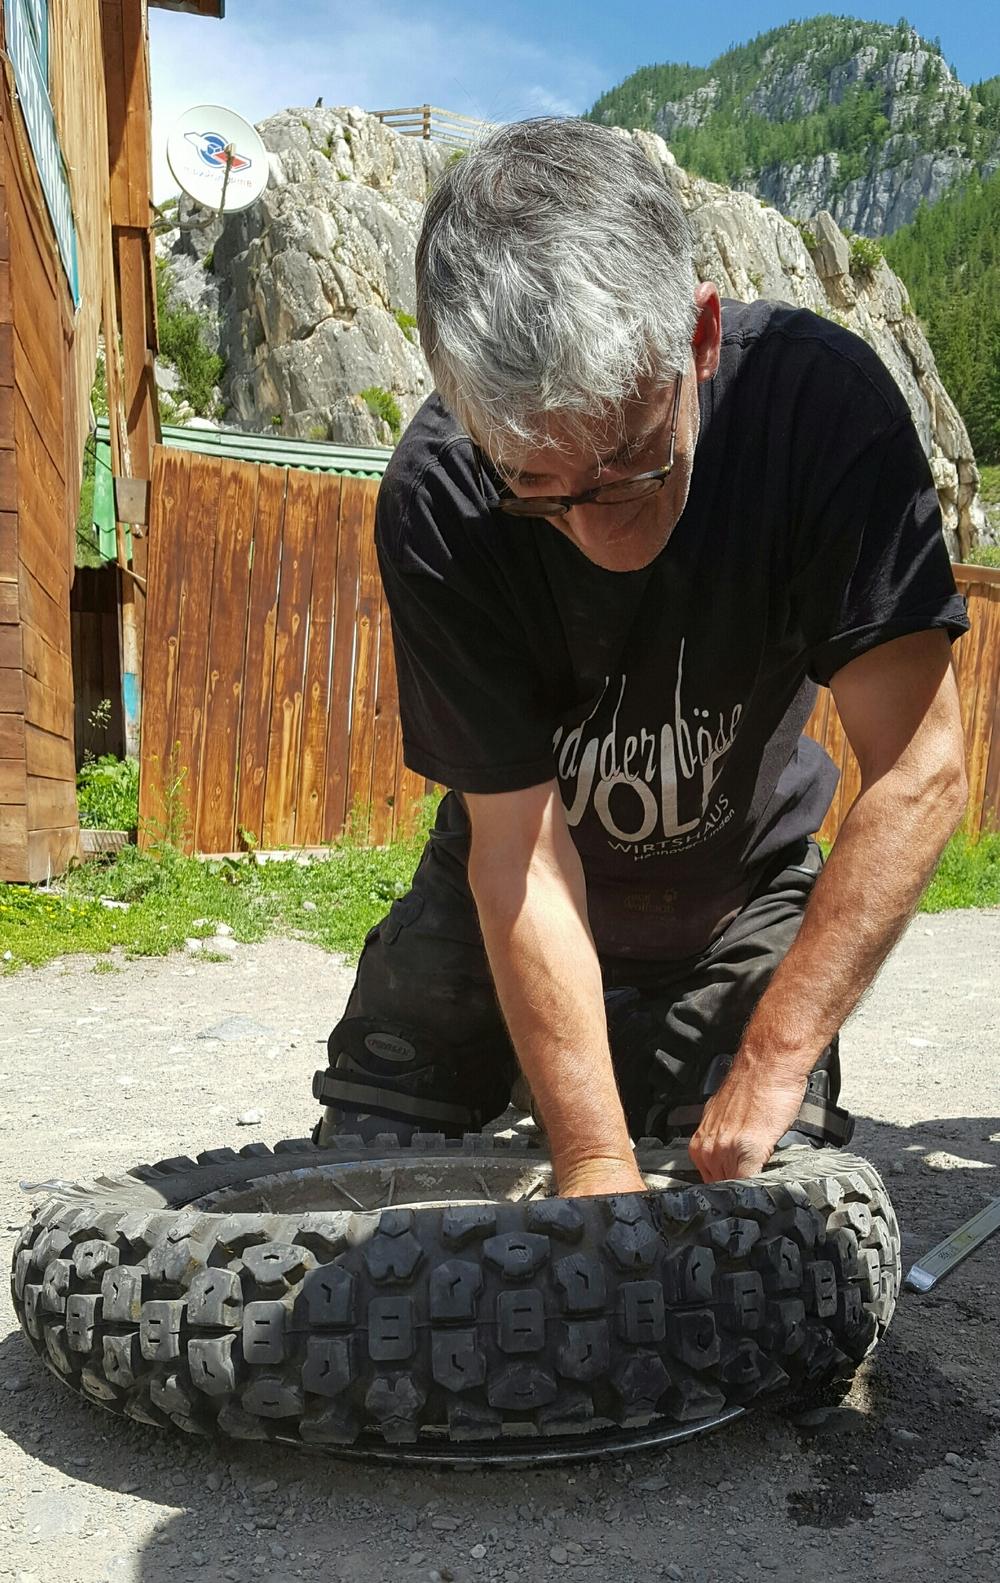 Repairing Herbert's puncture